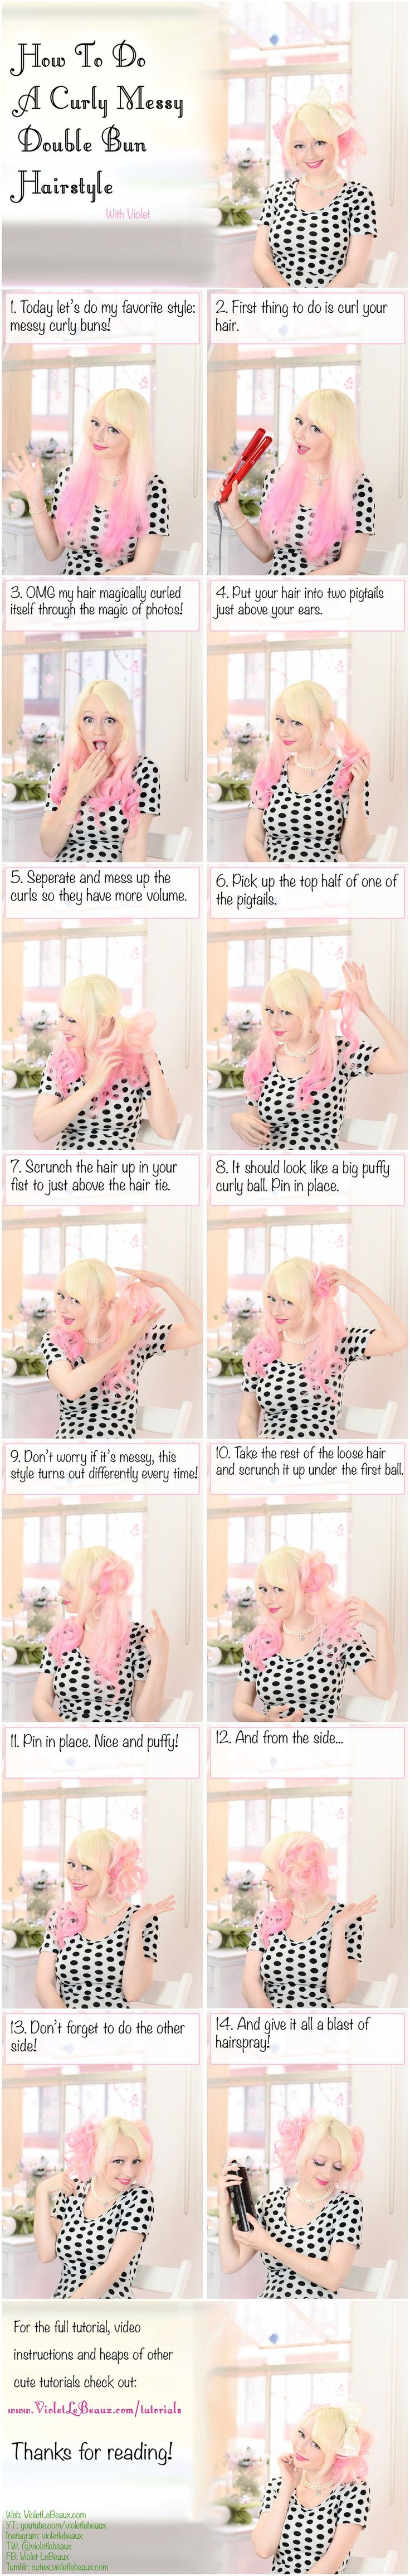 #hairstyle #hairstyle #tutorial #tutorial #rycomau